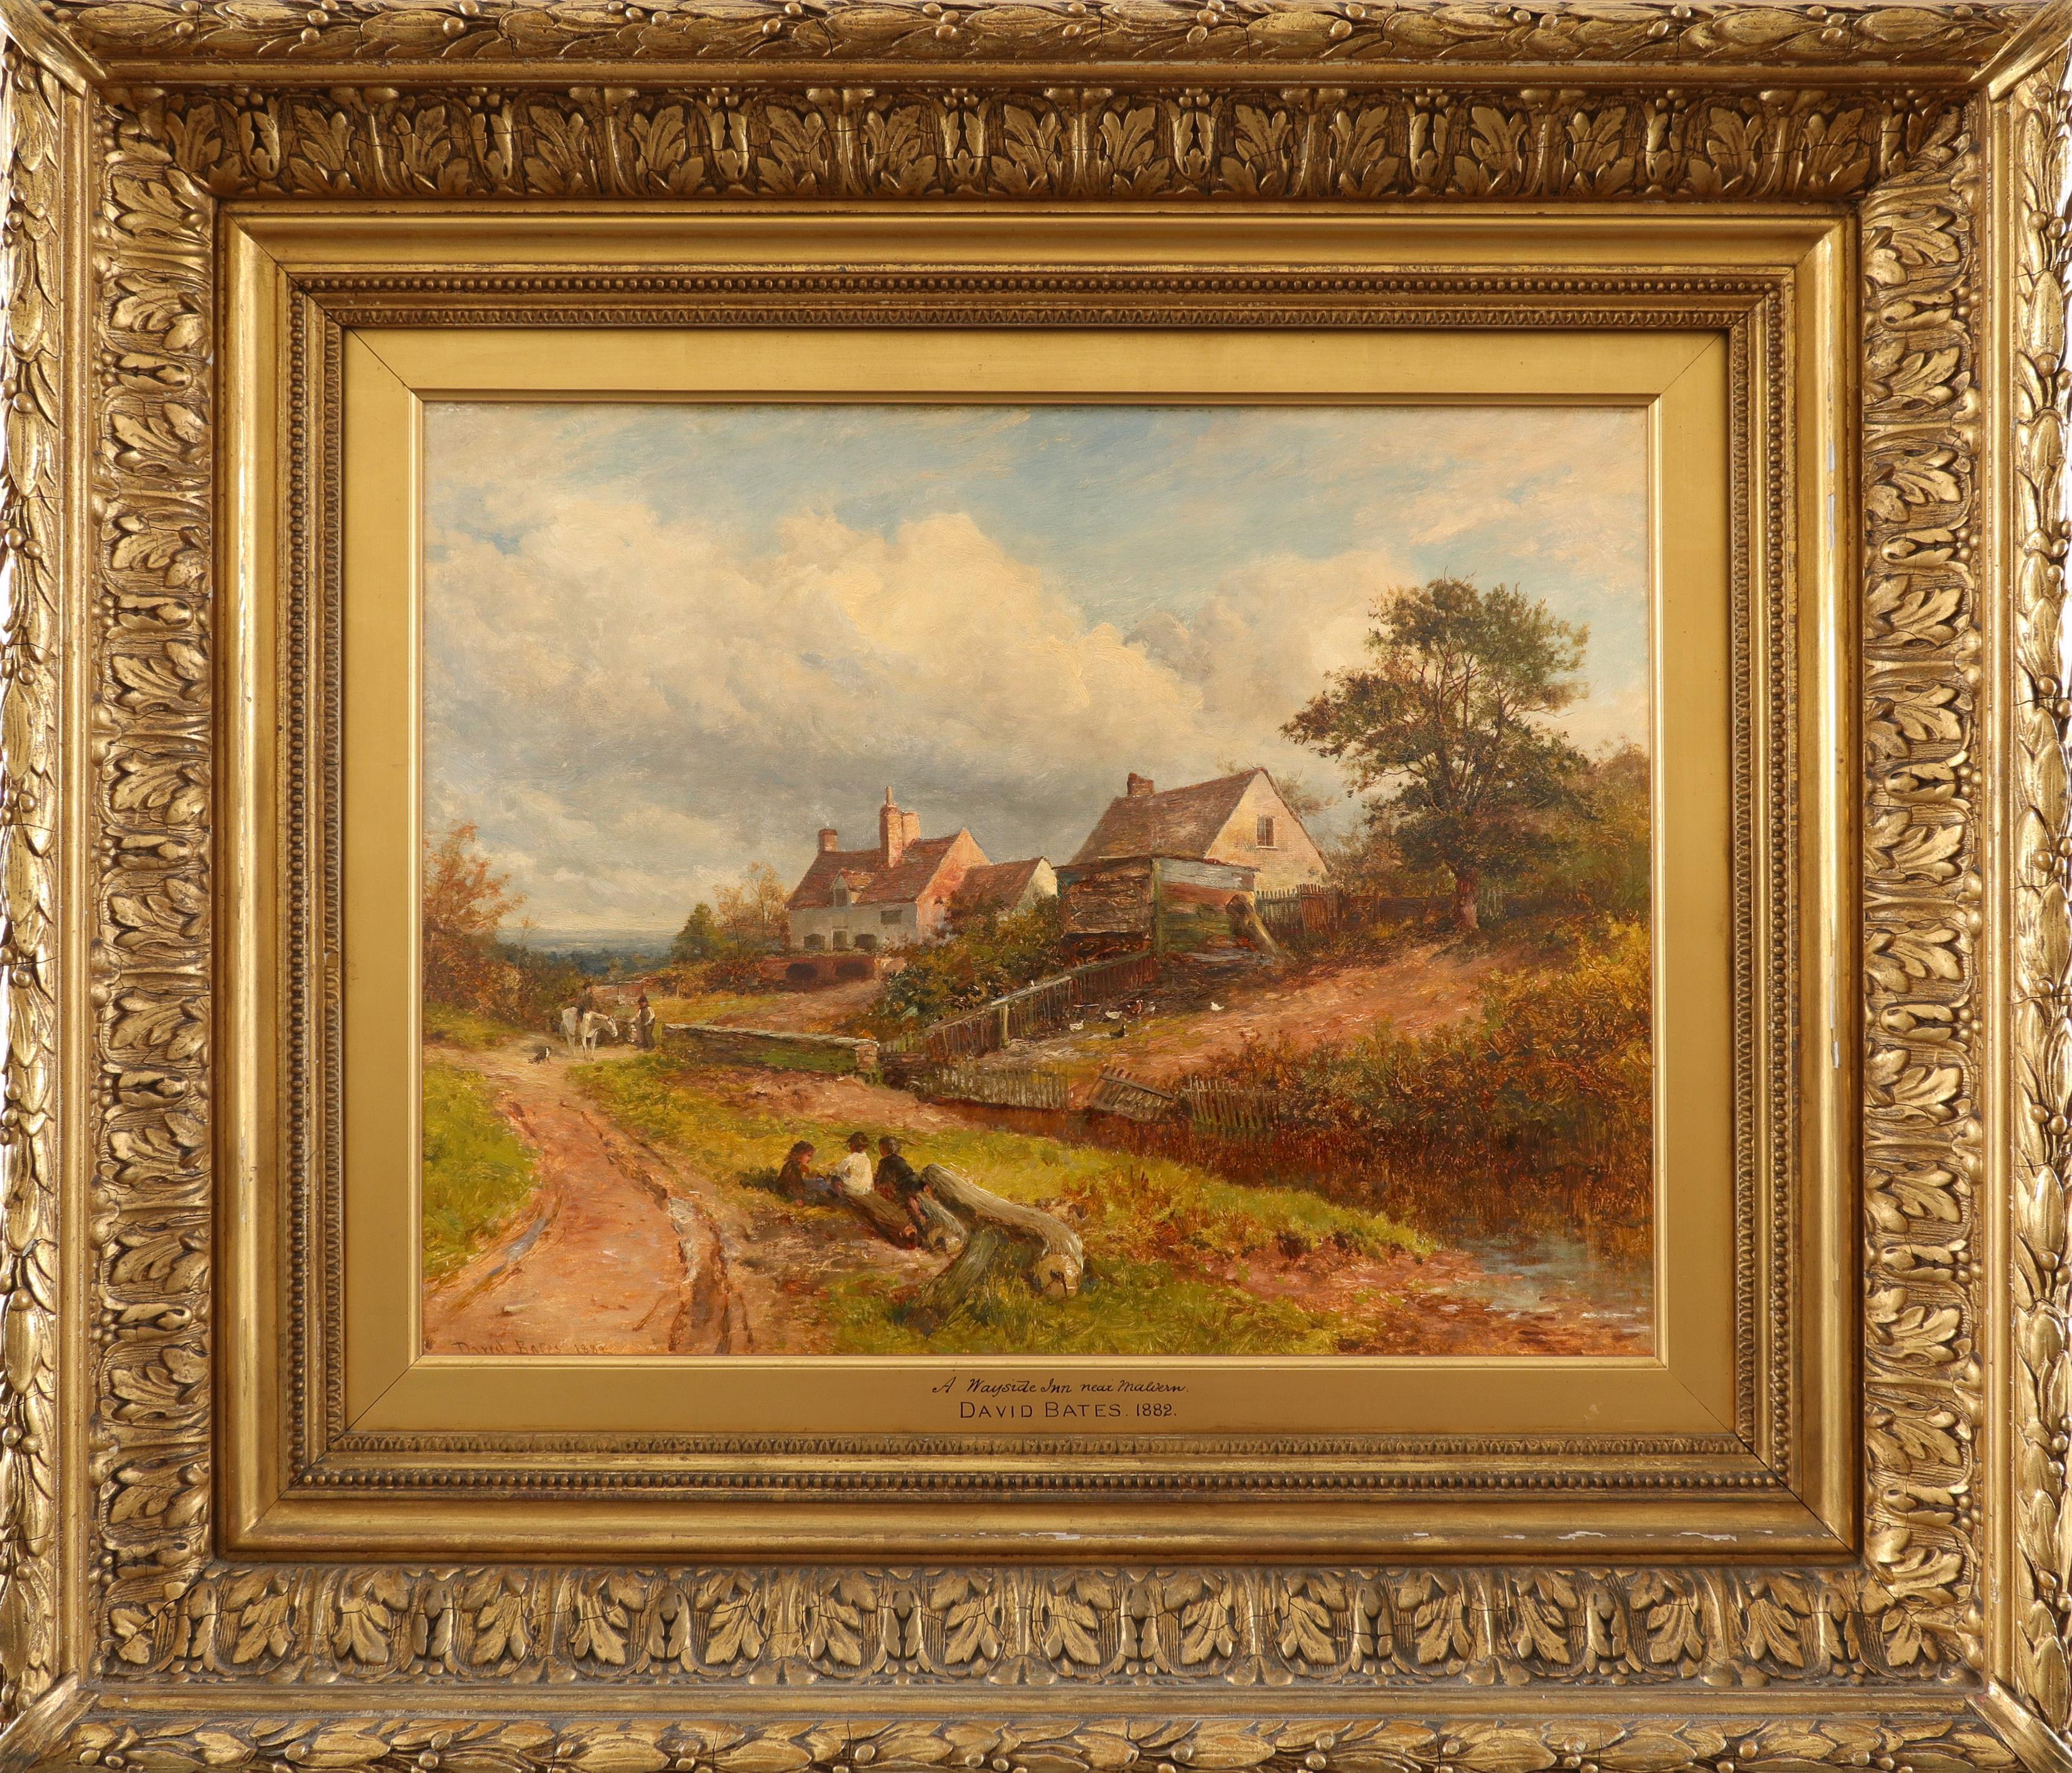 David Bates (1840-1921) A wayside inn near Malvern Signed and dated David Bates 1882 (lower left), - Image 2 of 3